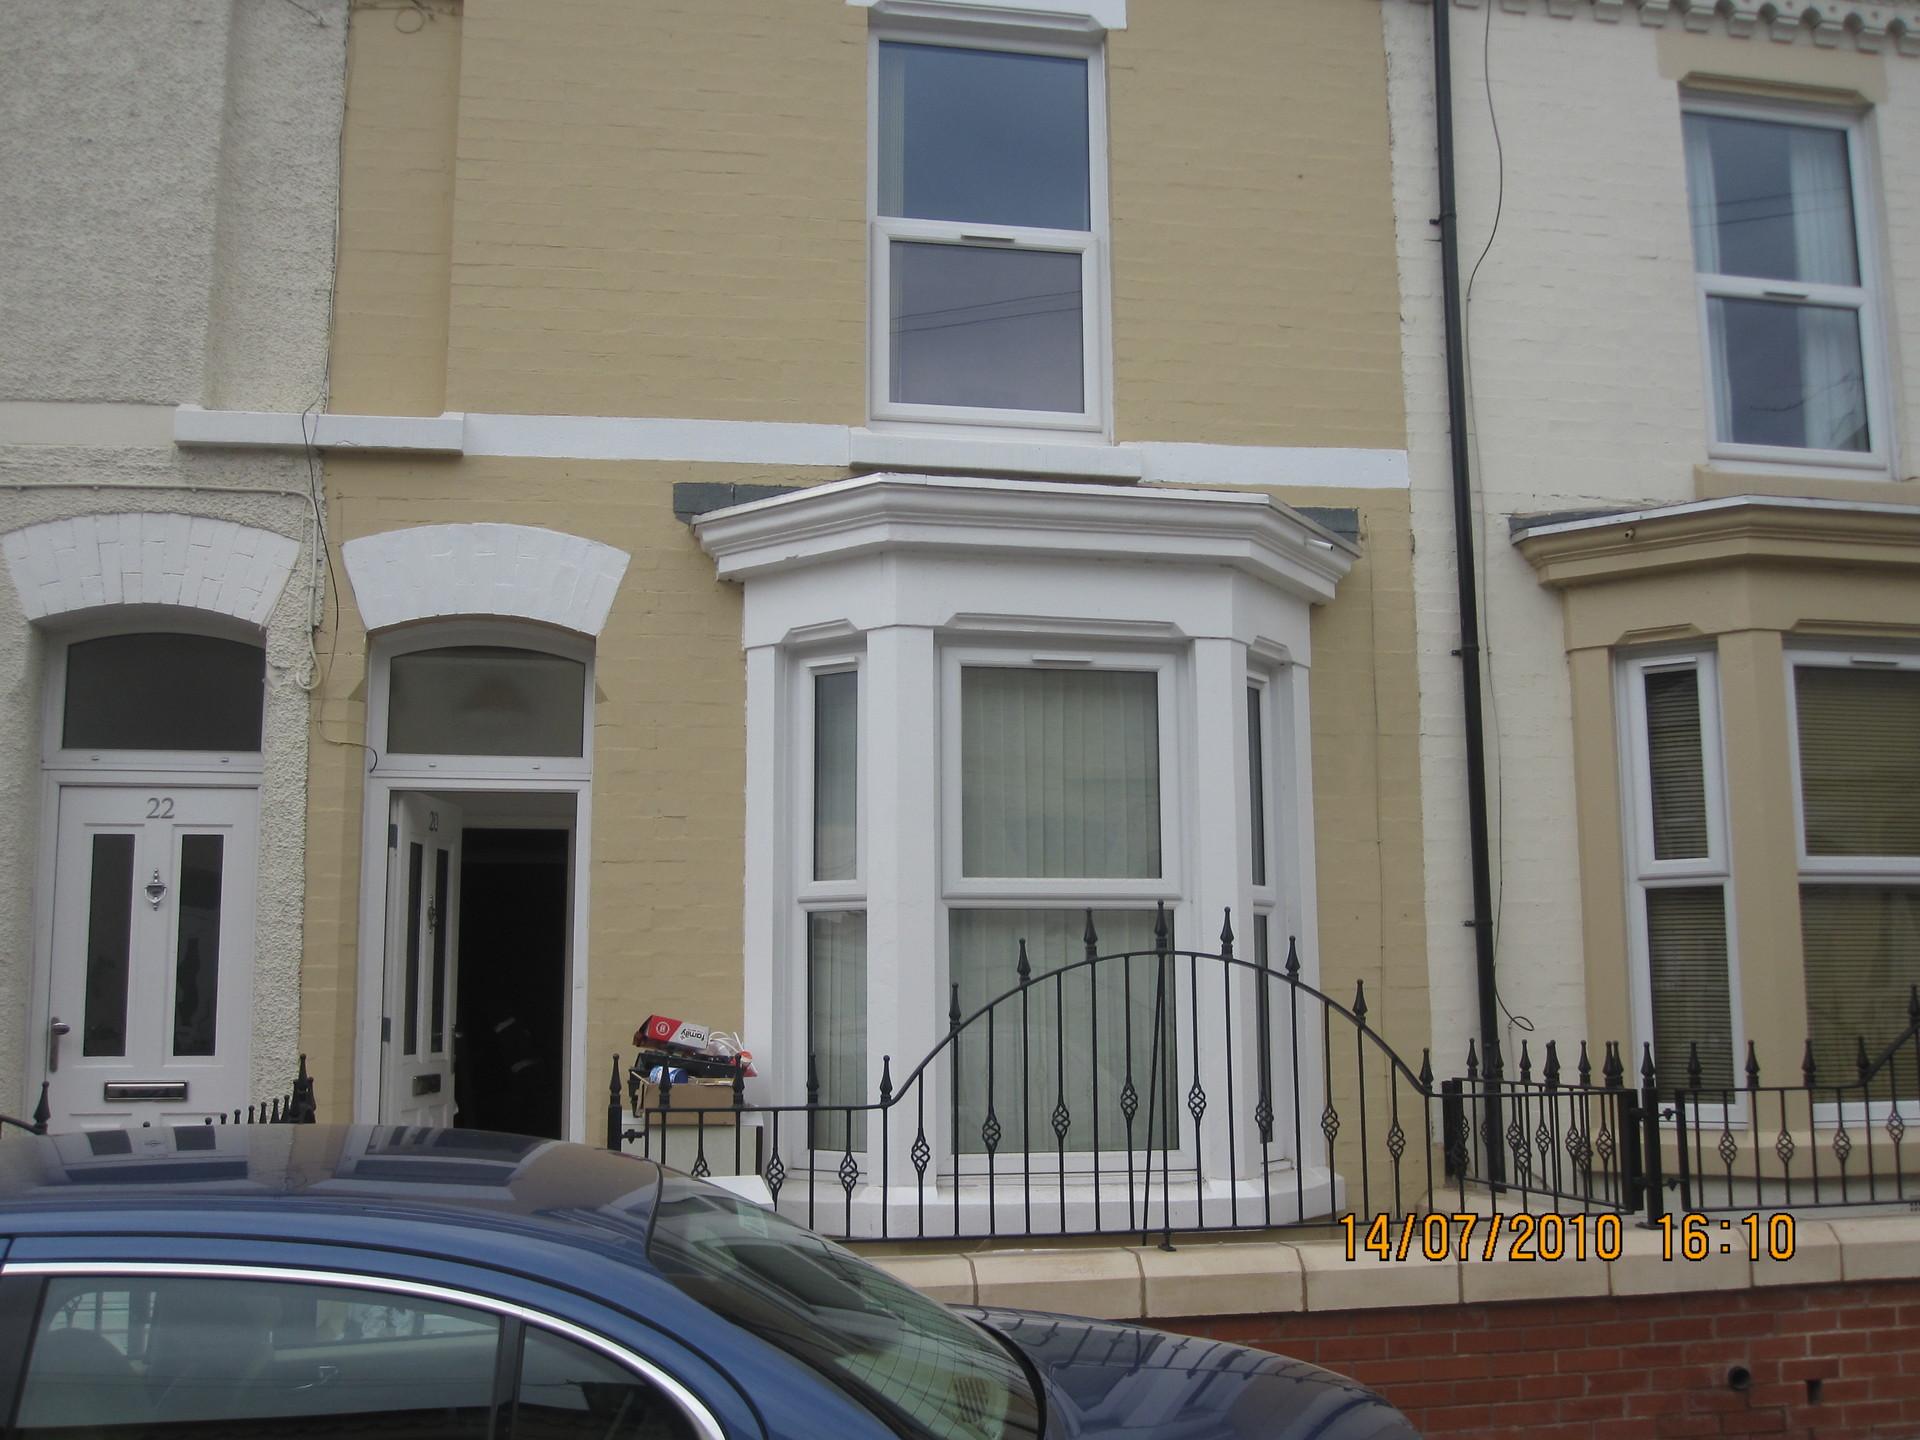 20 Stamford St, Liverpool L7 2PT, UK